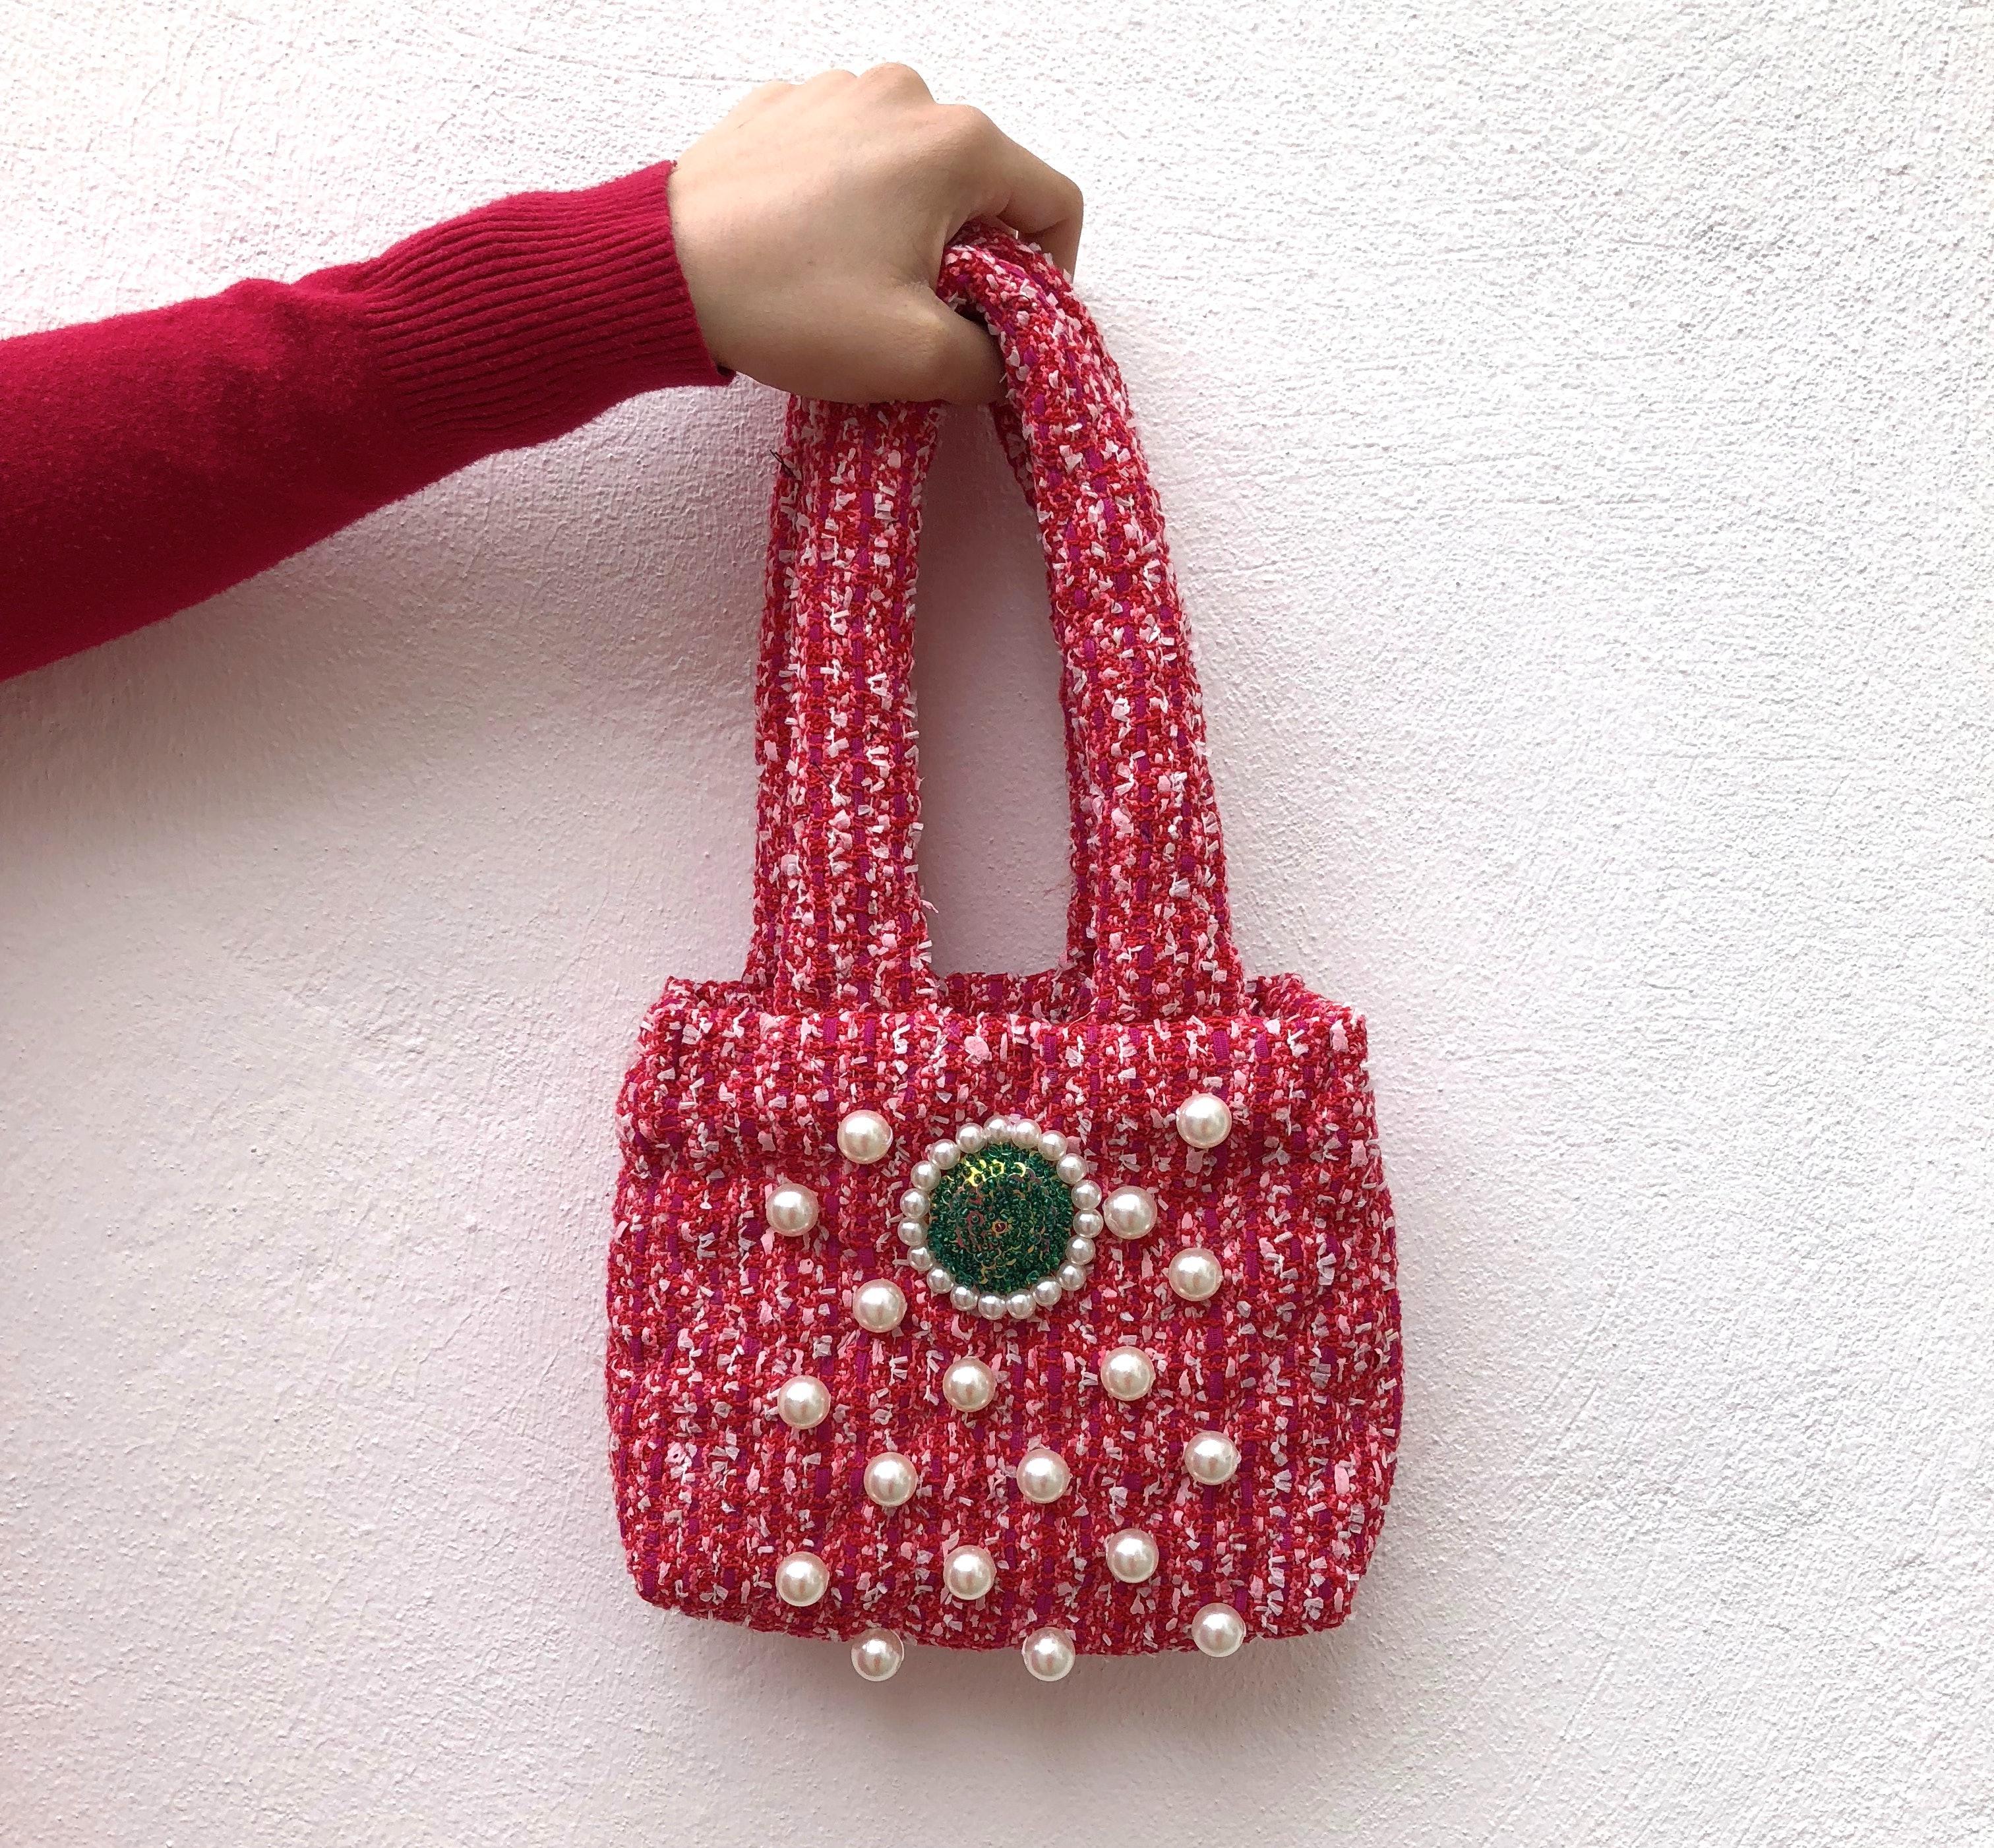 5739e0732ea4 7 New Handbag Designers That'll Bring In All The Likes